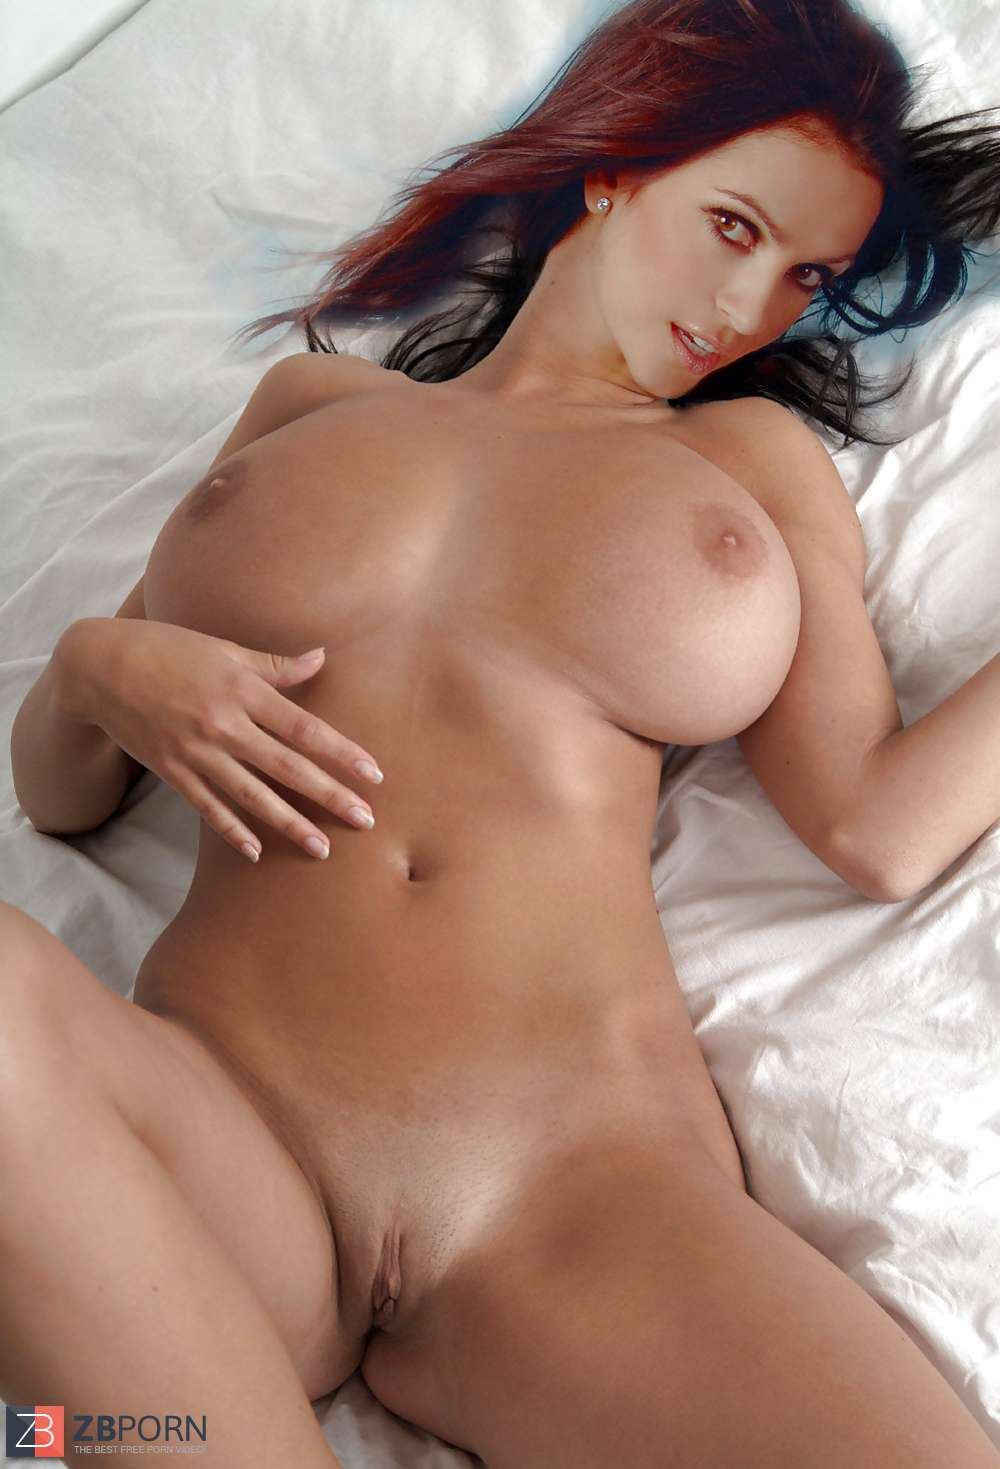 milani Porn fake denise images star porn